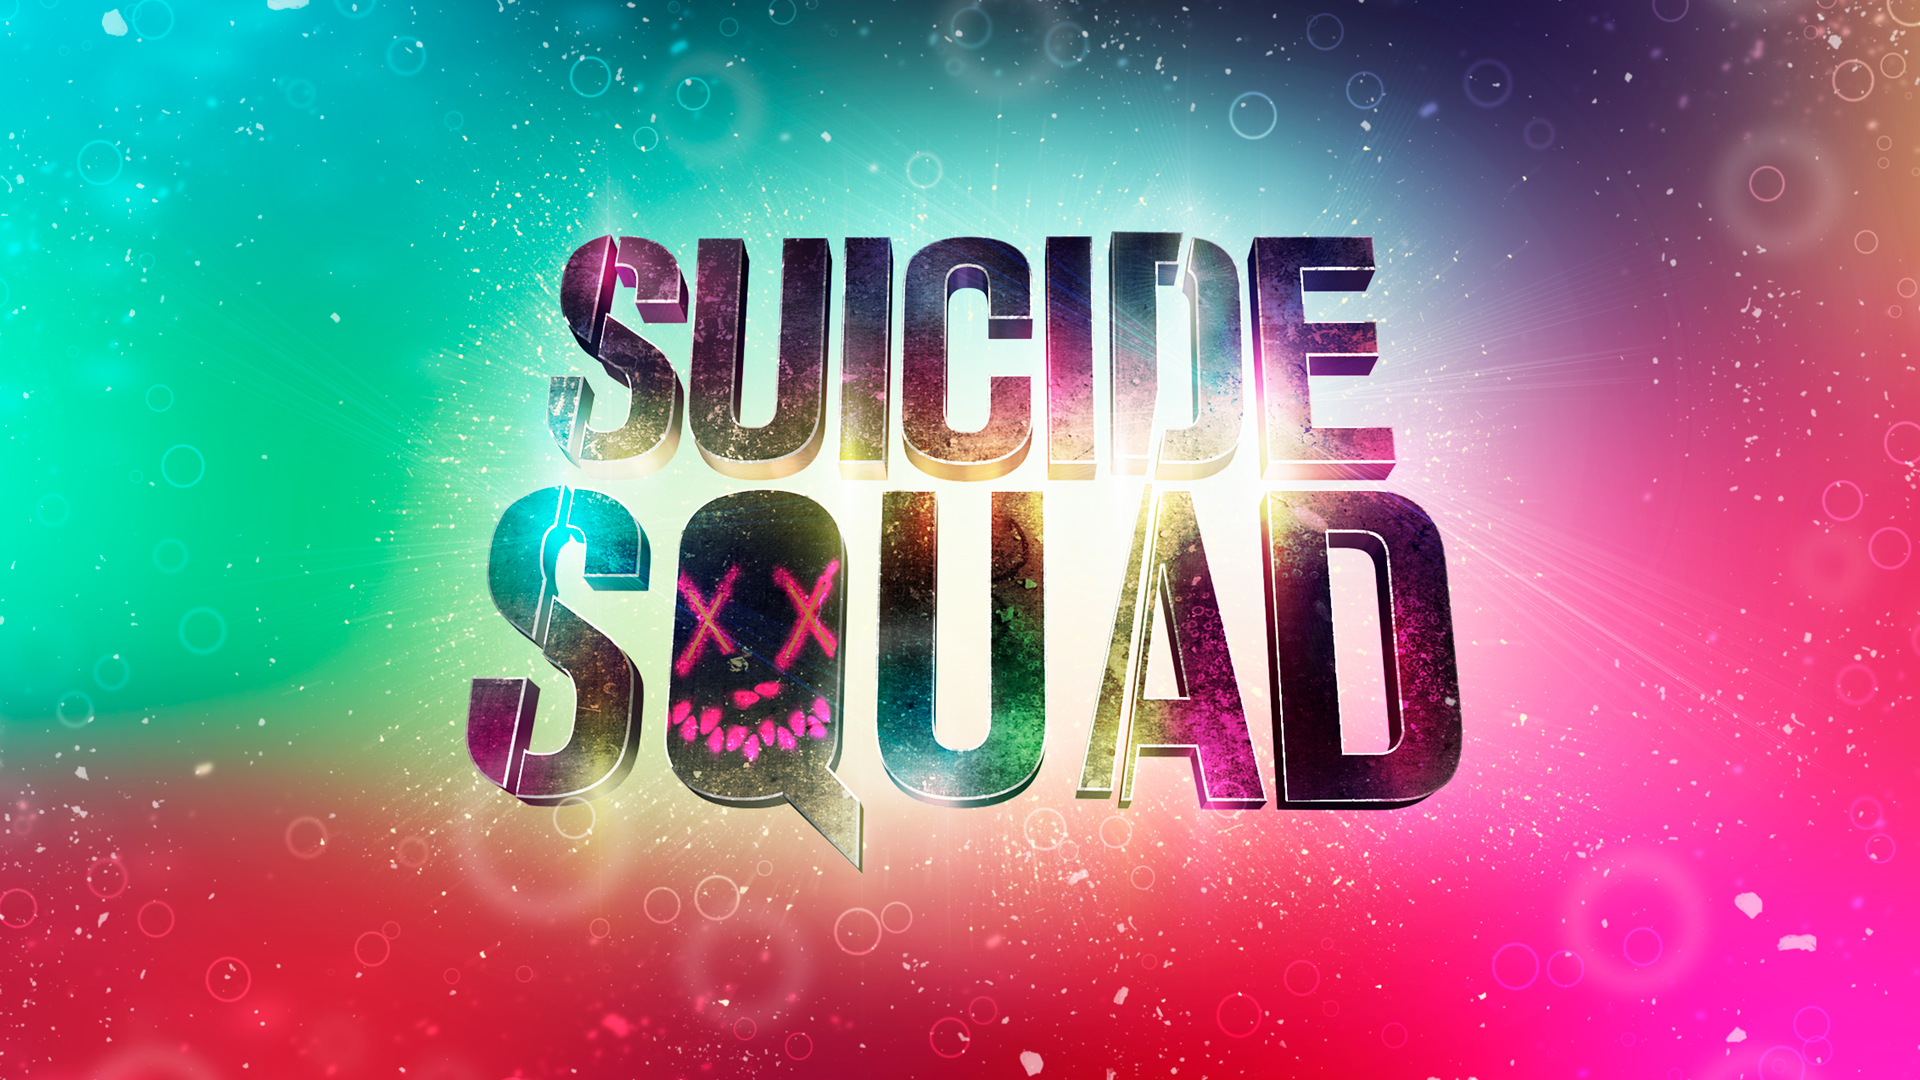 Parallax 3d Effect Wallpaper Pro How To Make Suicide Squad 3d Text Effect Photoshop Cc